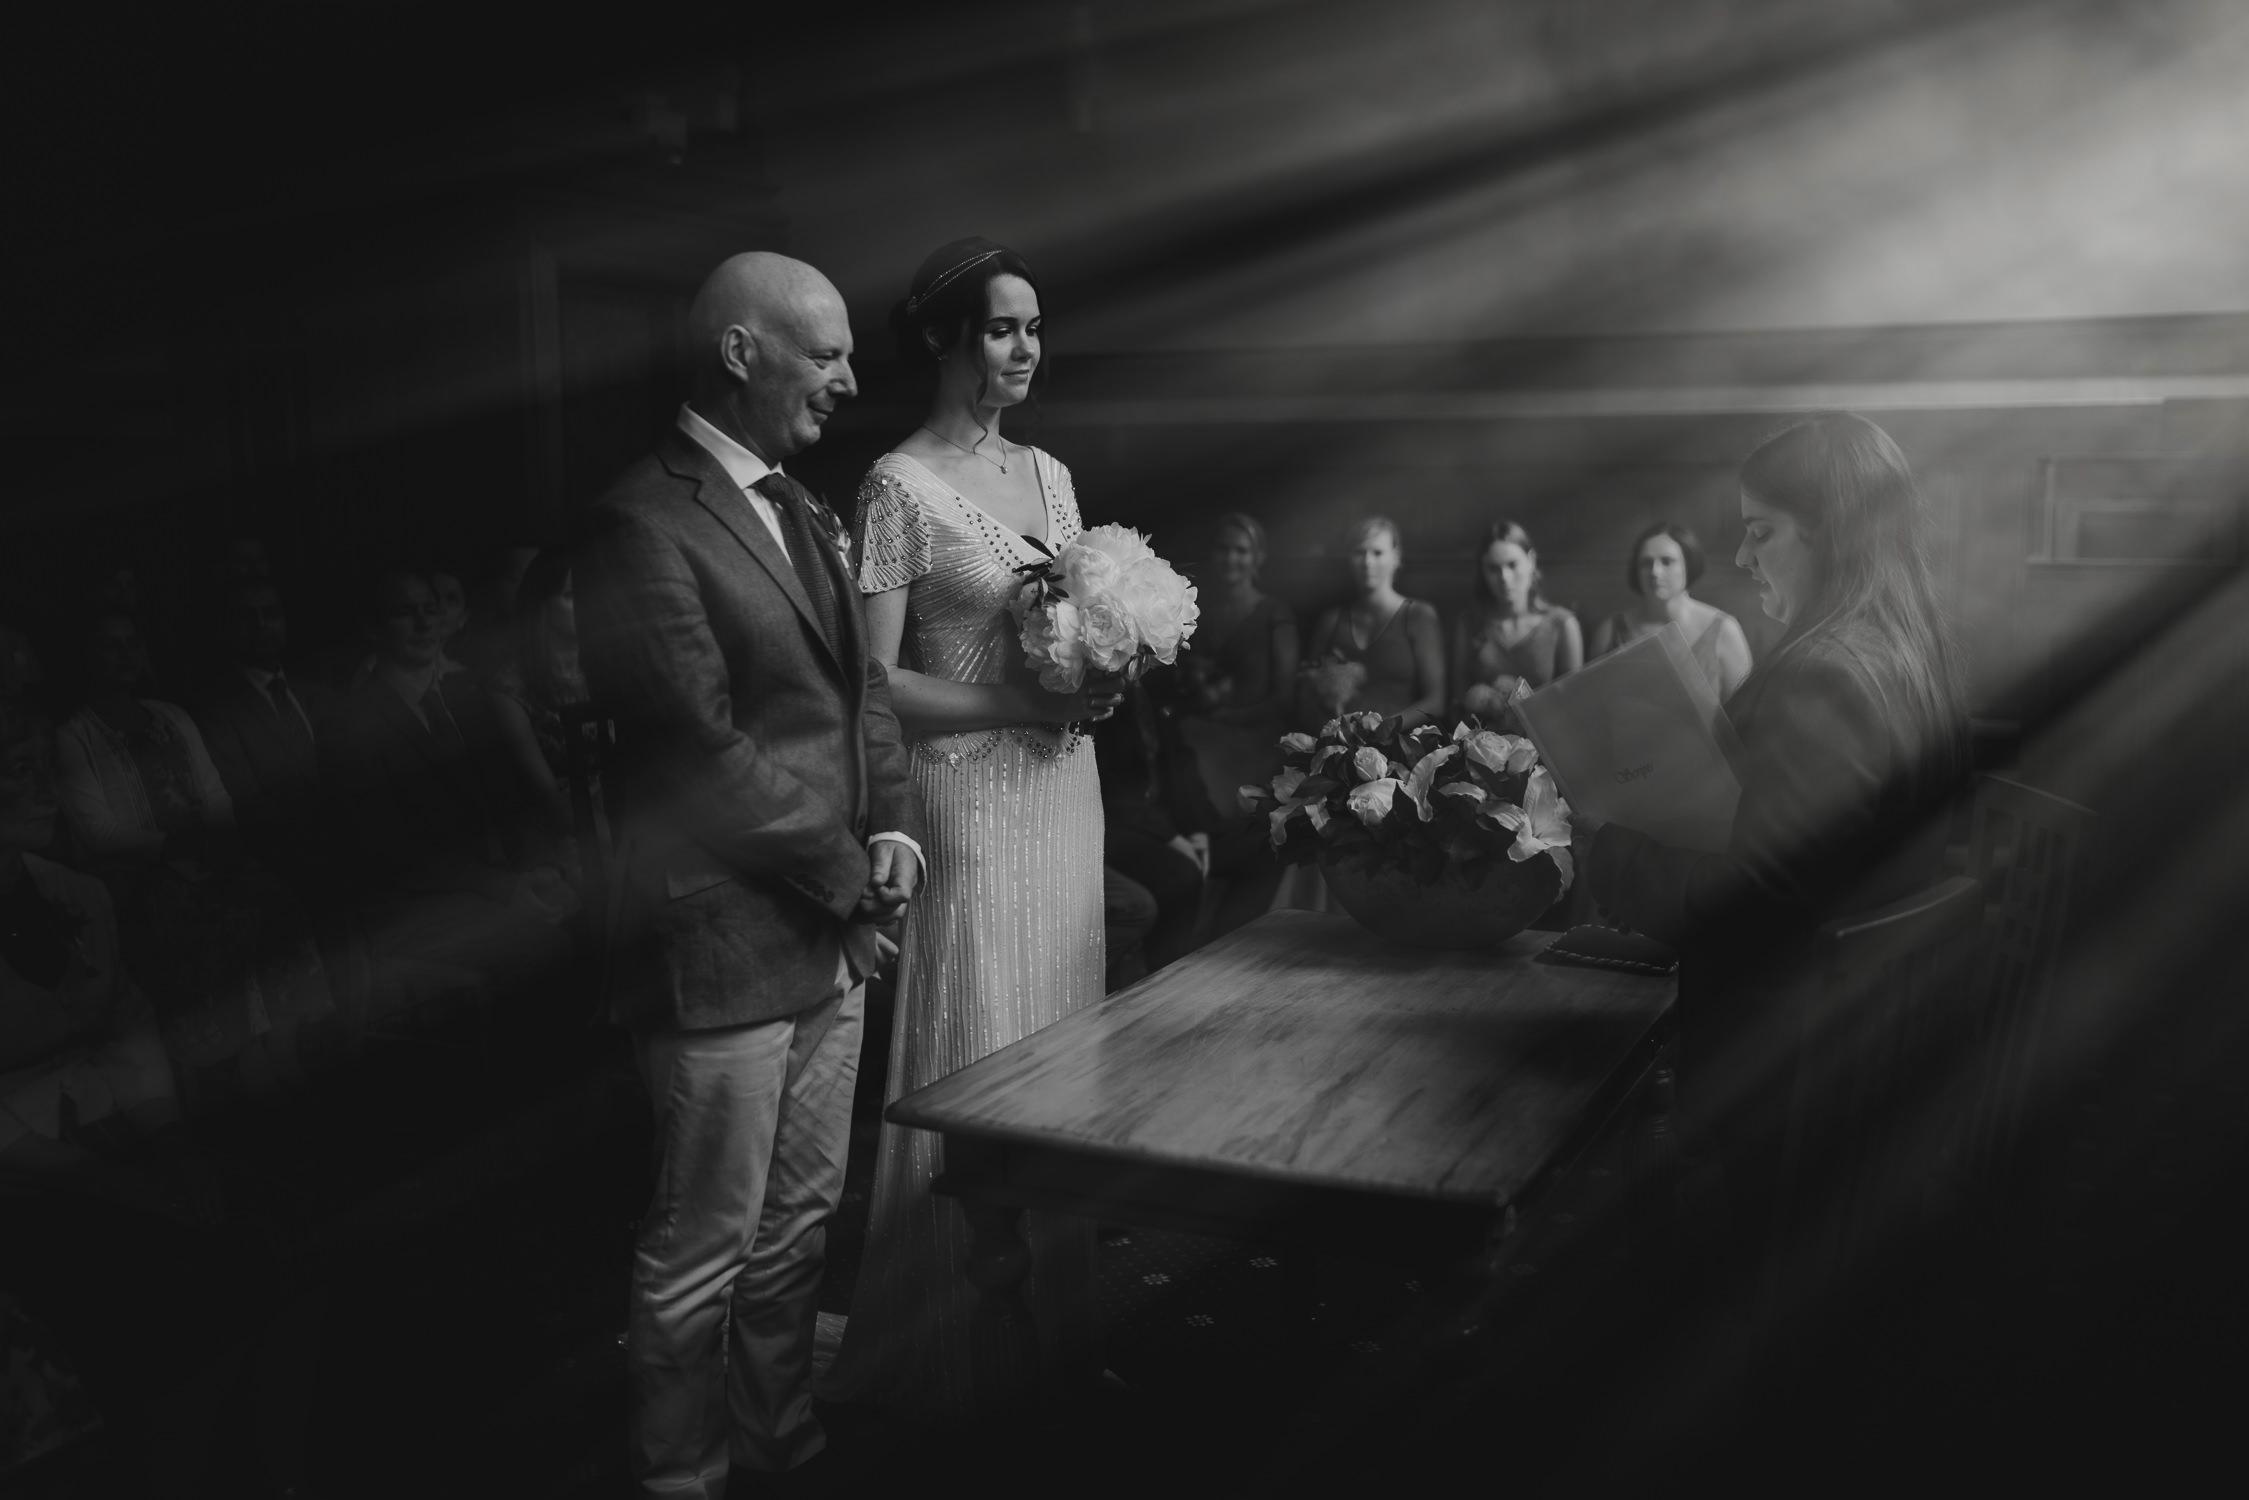 amsterdam trouwfotograaf mark hadden destination wedding photography london